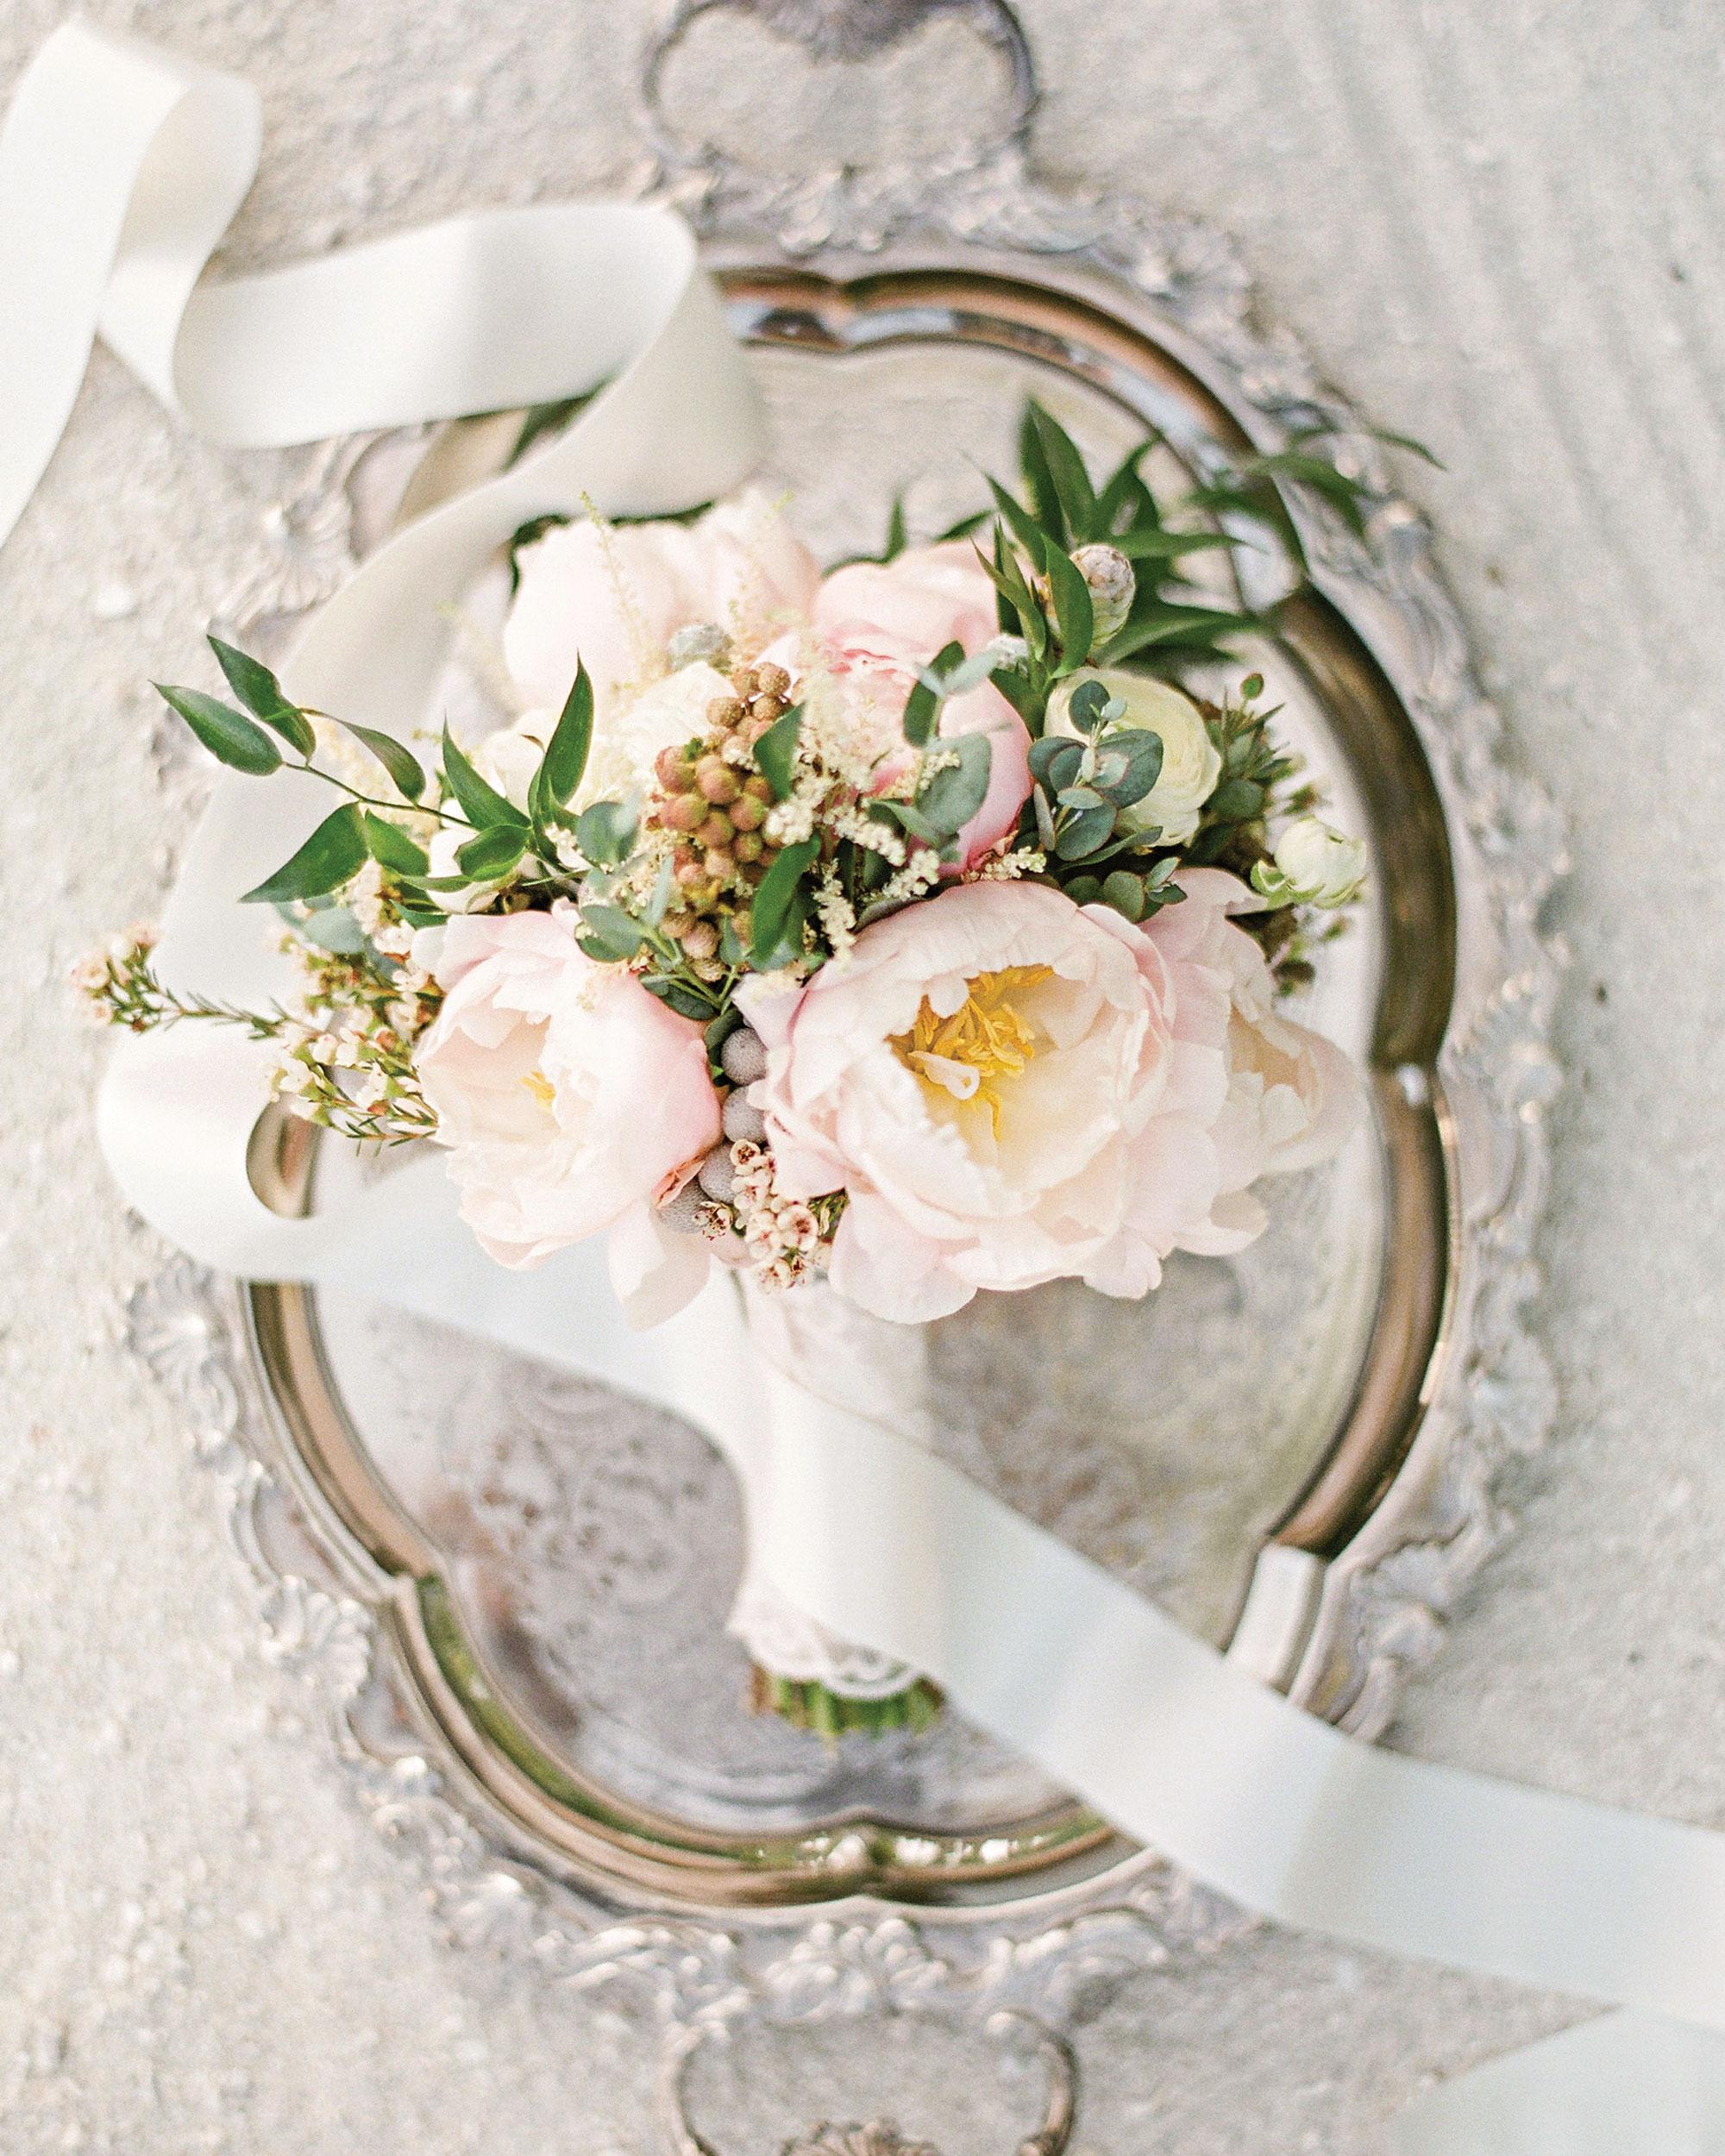 peony-richard-wedding-maldives-bouquet-pink-0885-s112383.jpg